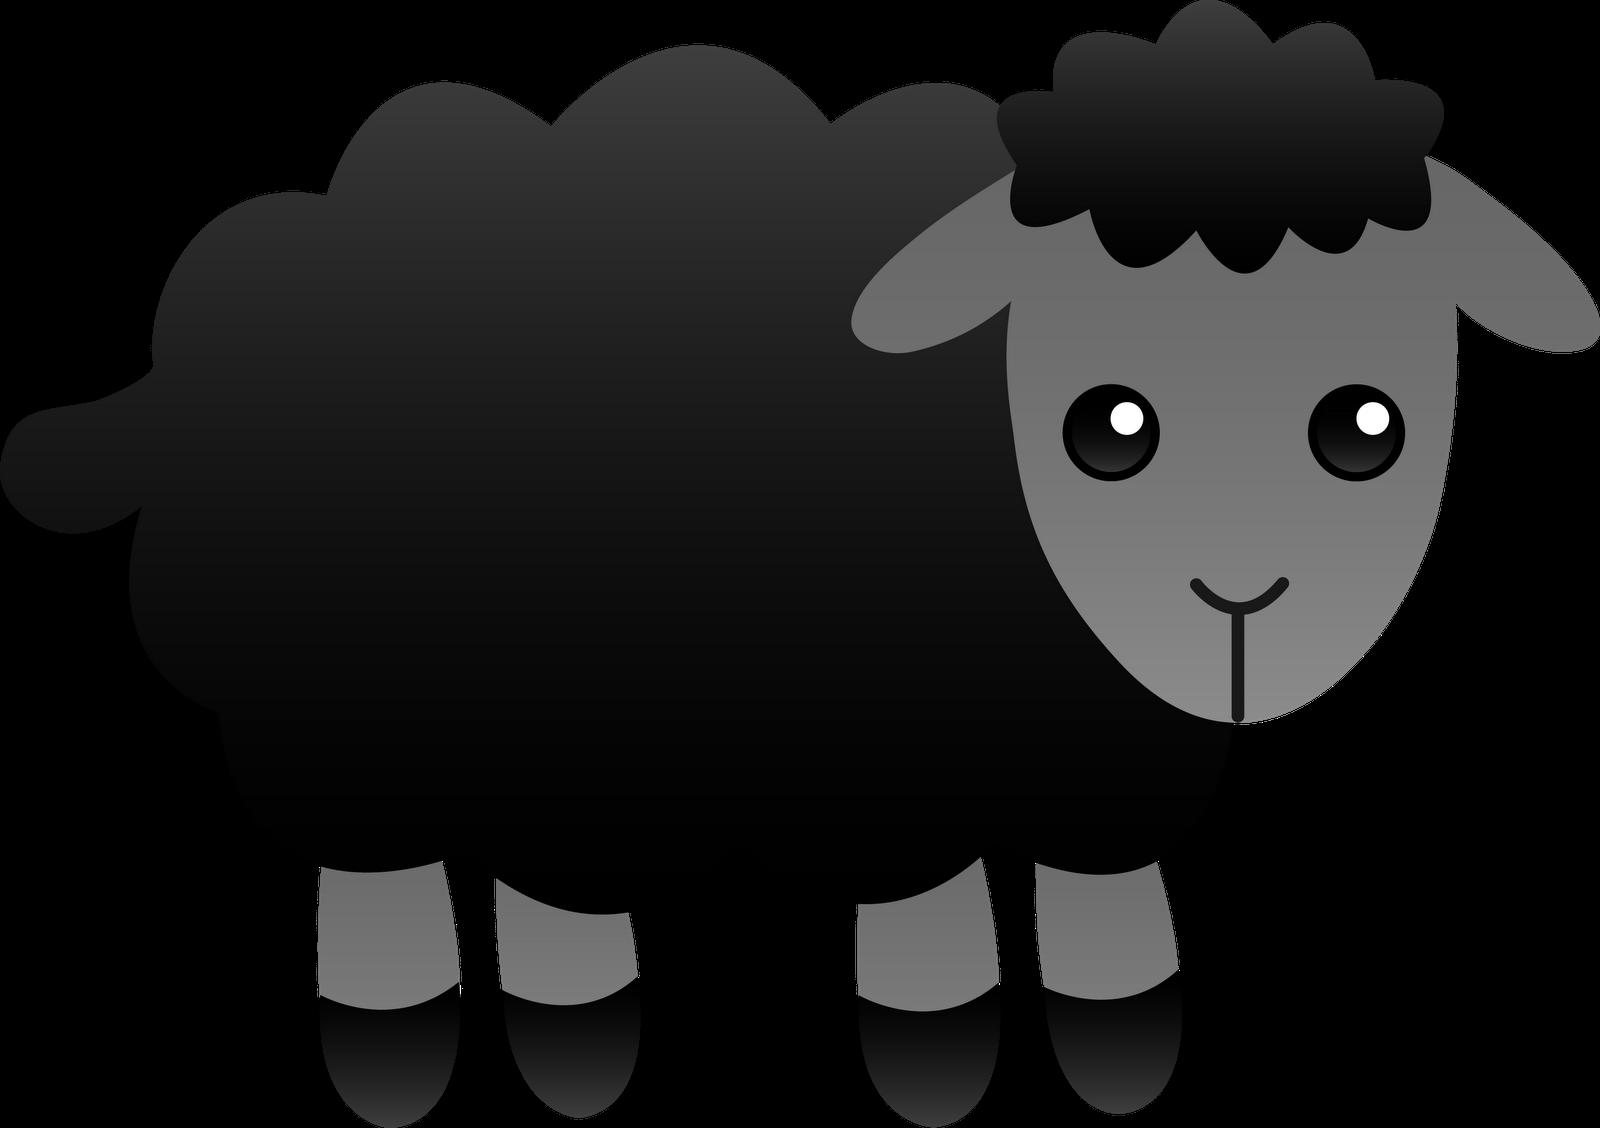 1600x1128 Image Of Black Sheep Clipart 5 Clip Art Free Vector